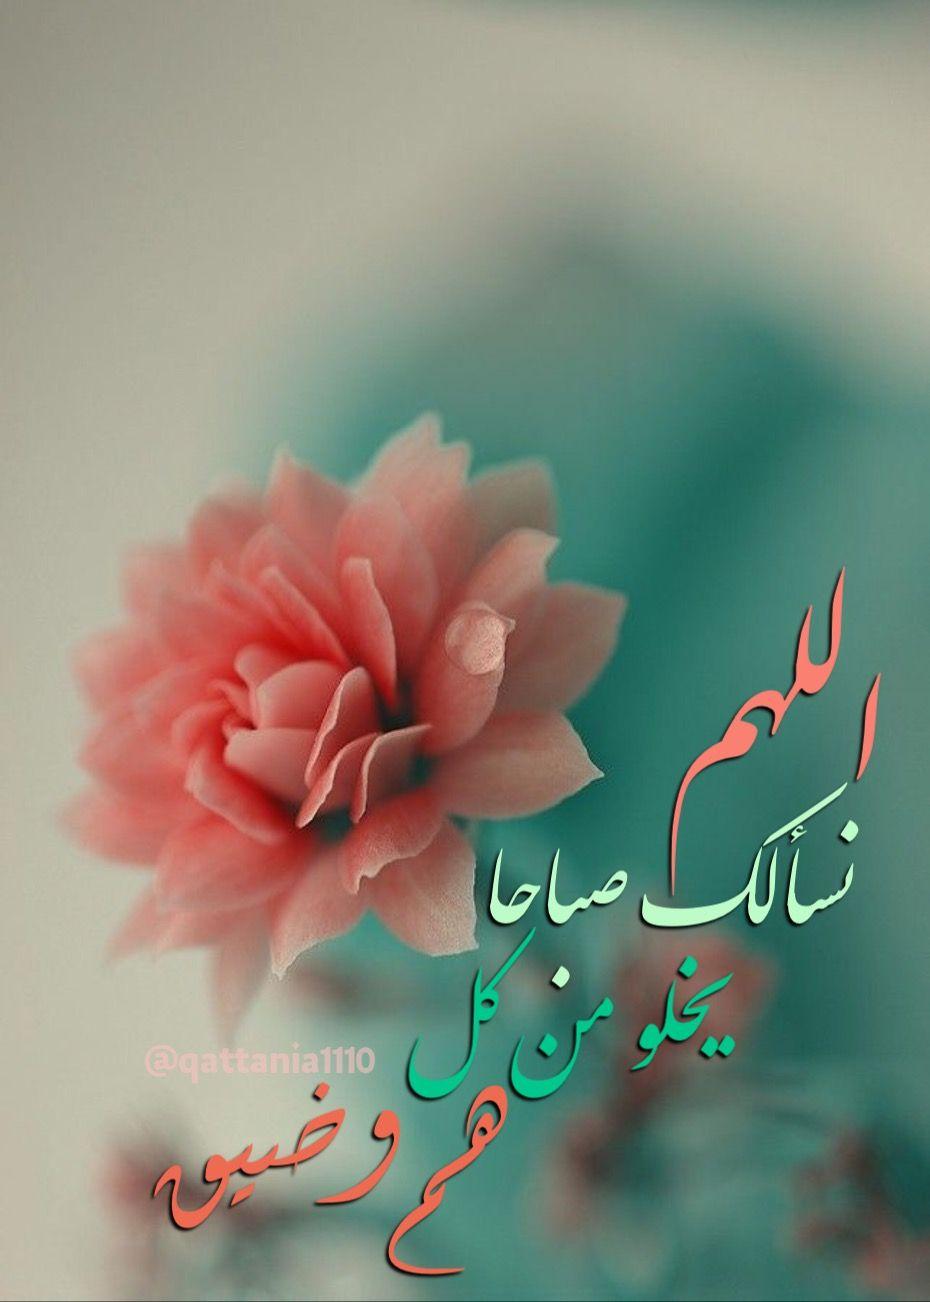 Pin By Skittchen On صباح الخير Goodmorning Good Morning Flowers Morning Images Morning Wish